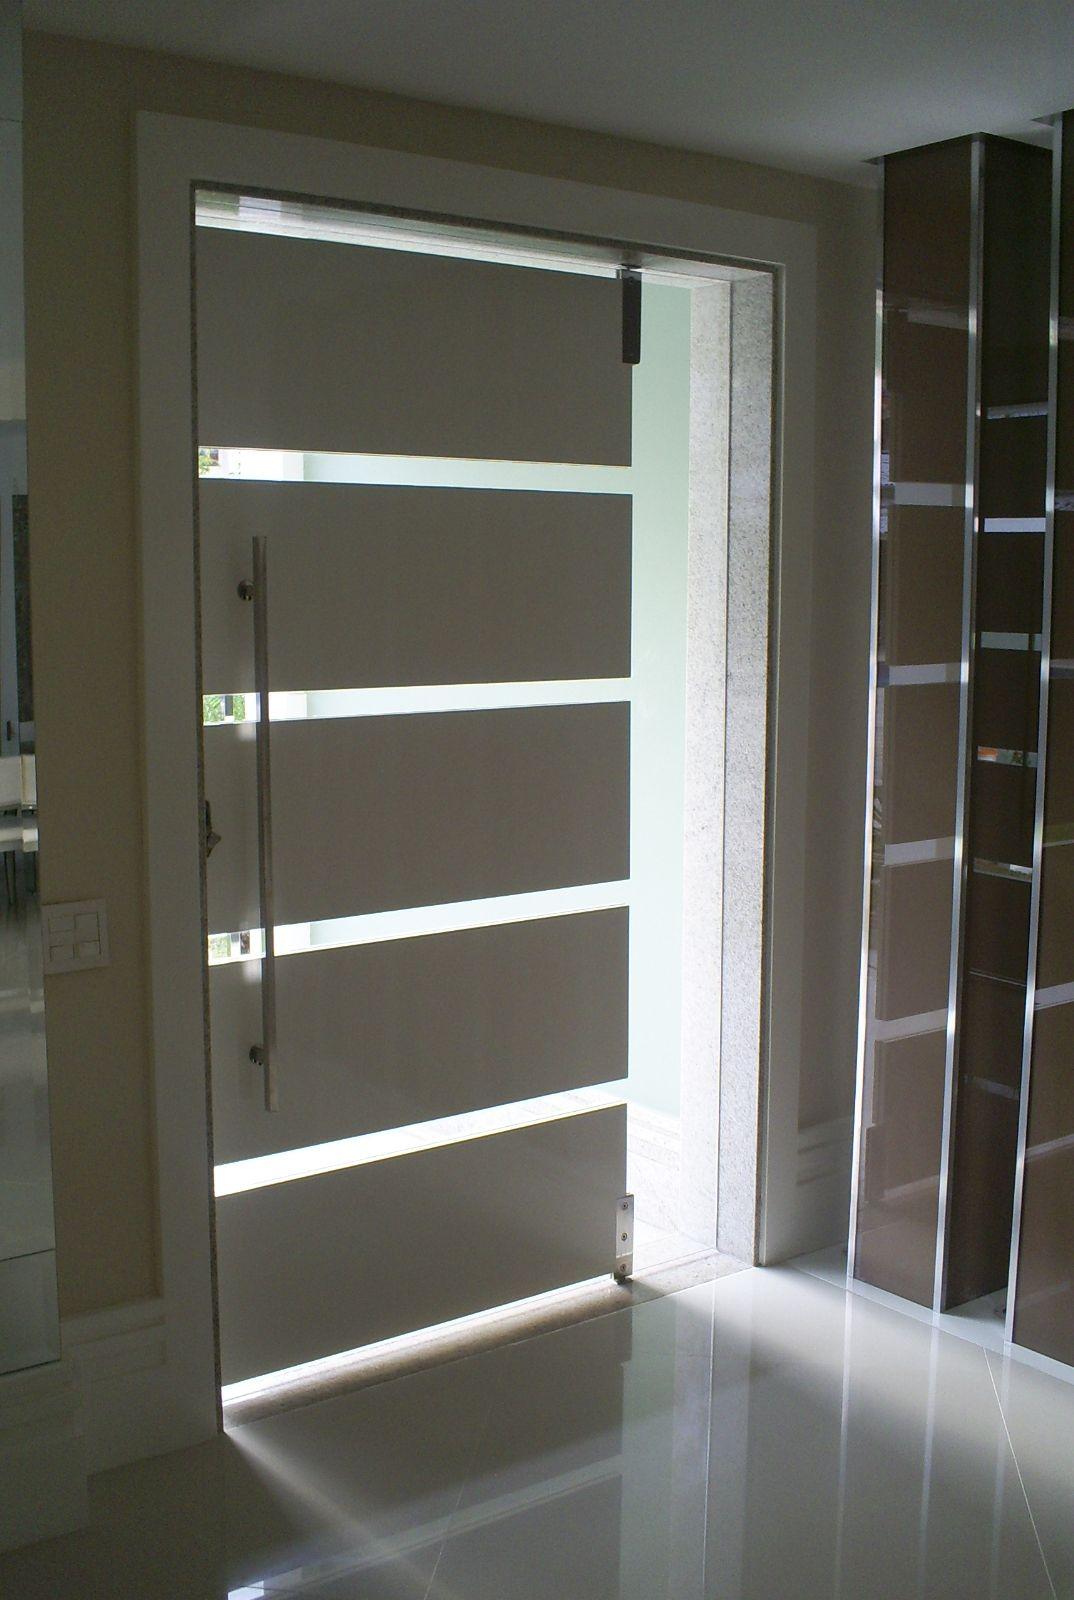 Porta moderna para sua casa puertas de hierro seguridad for Puertas de entrada de casas modernas